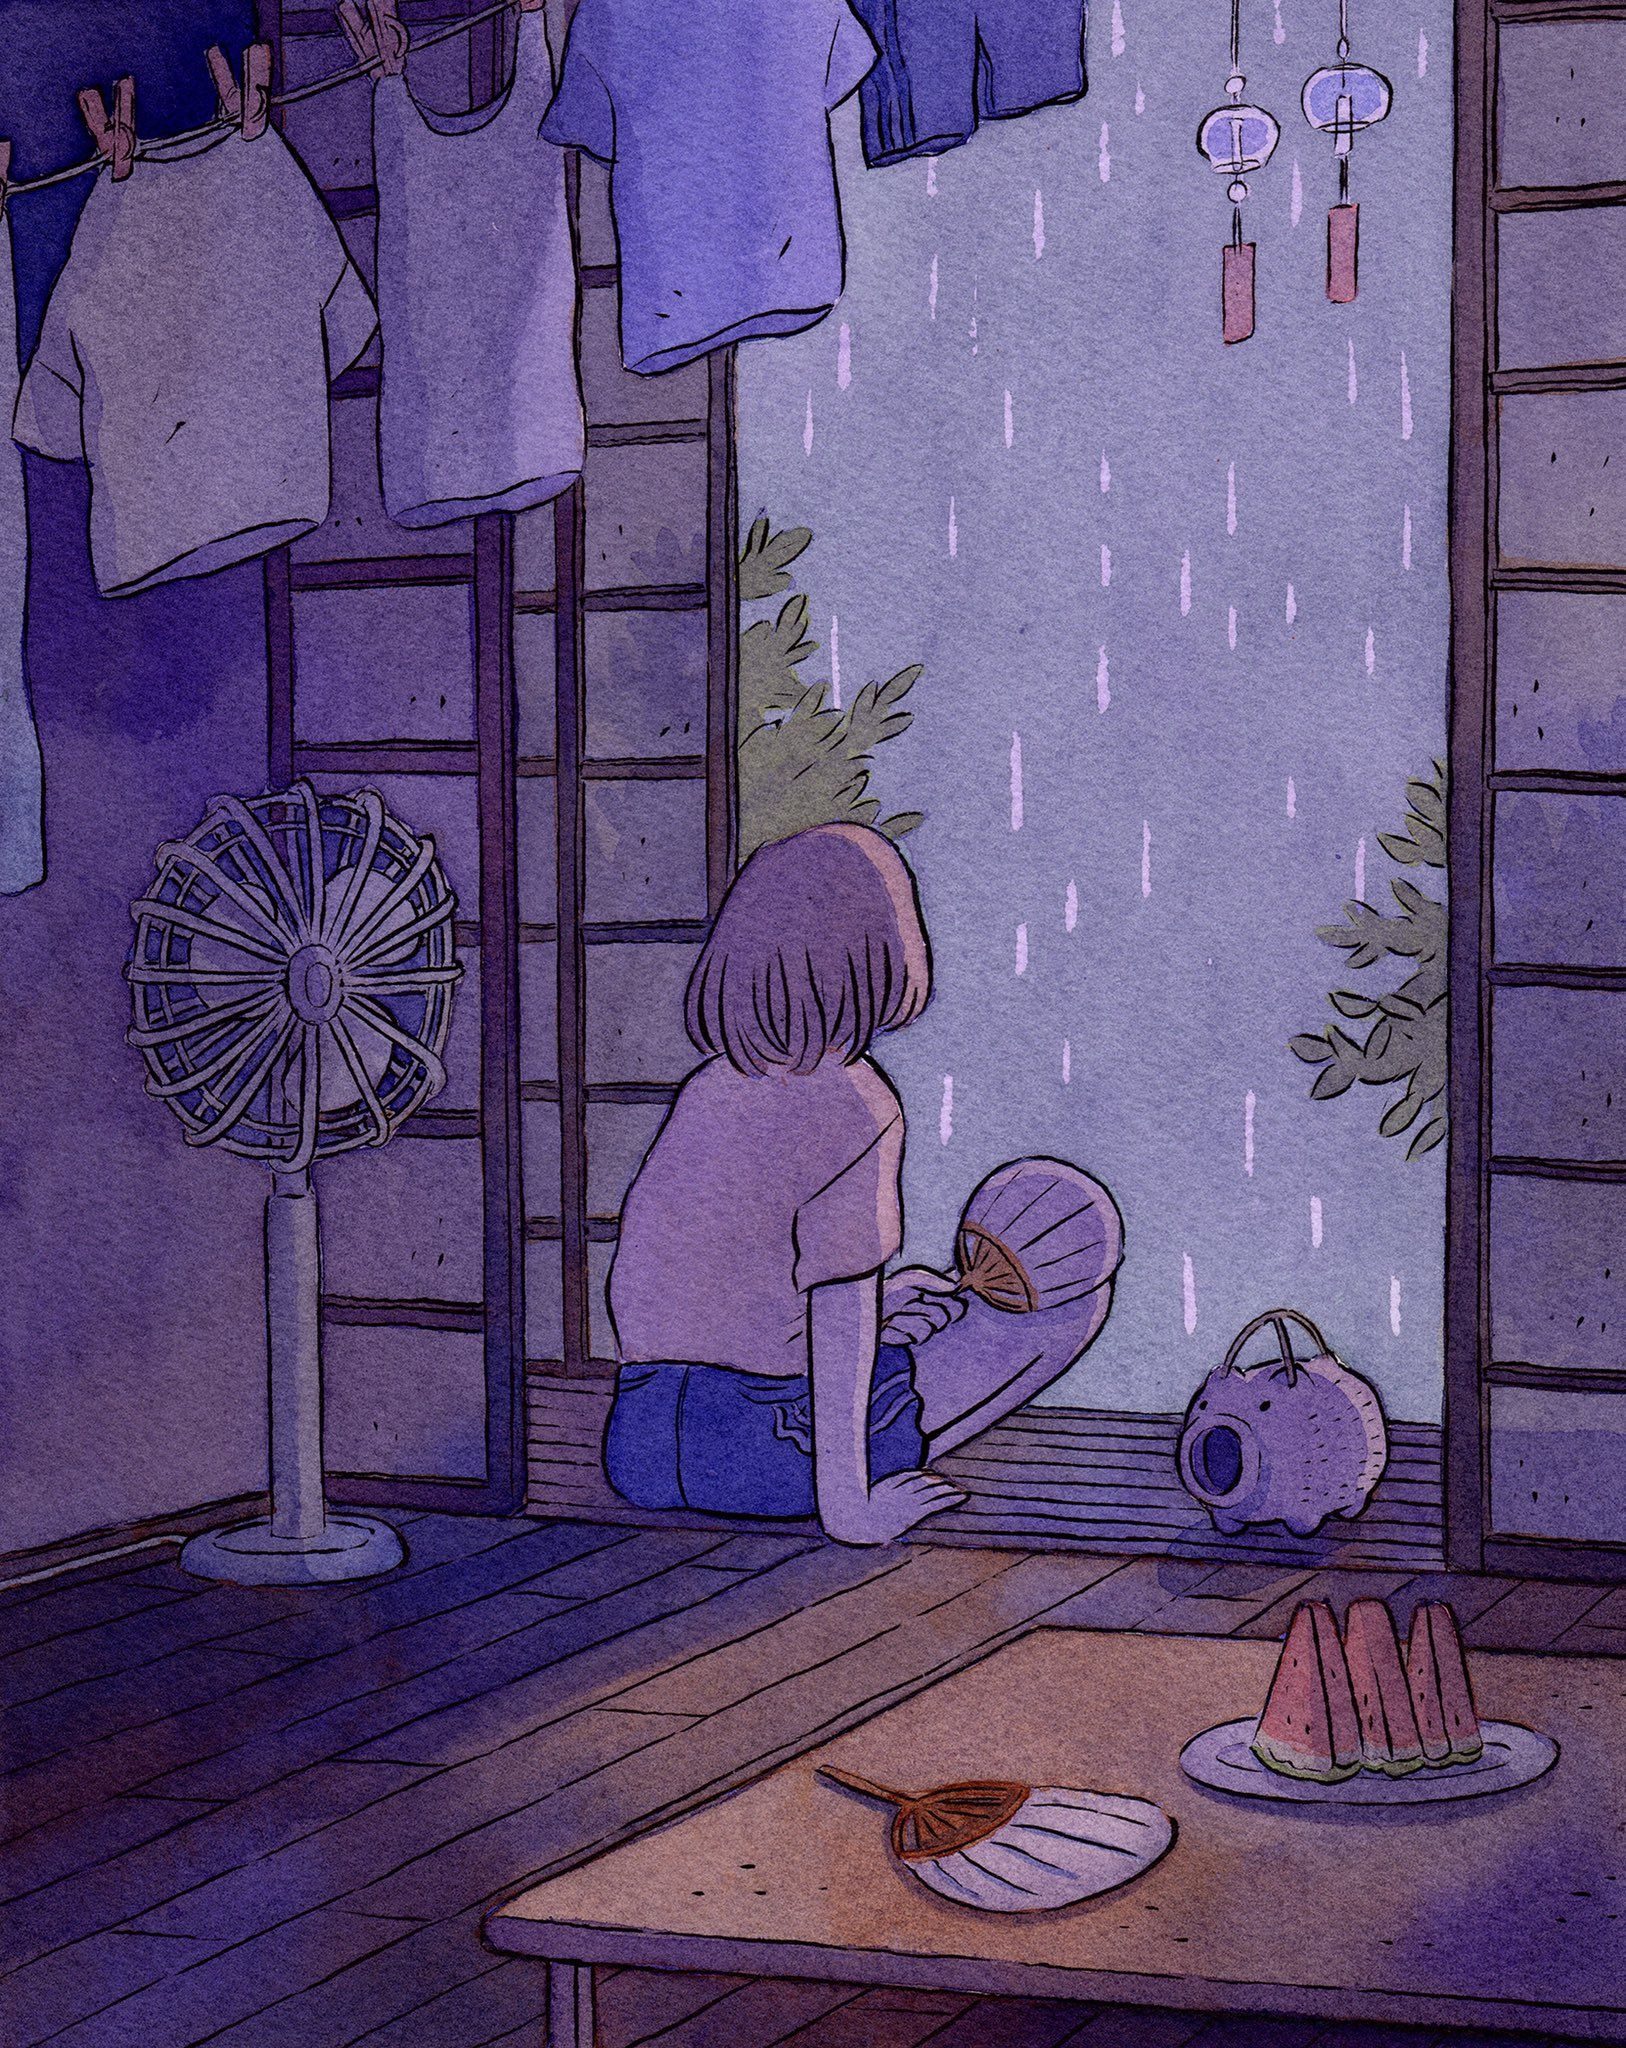 Heikala on in 2020 Aesthetic art, Aesthetic anime